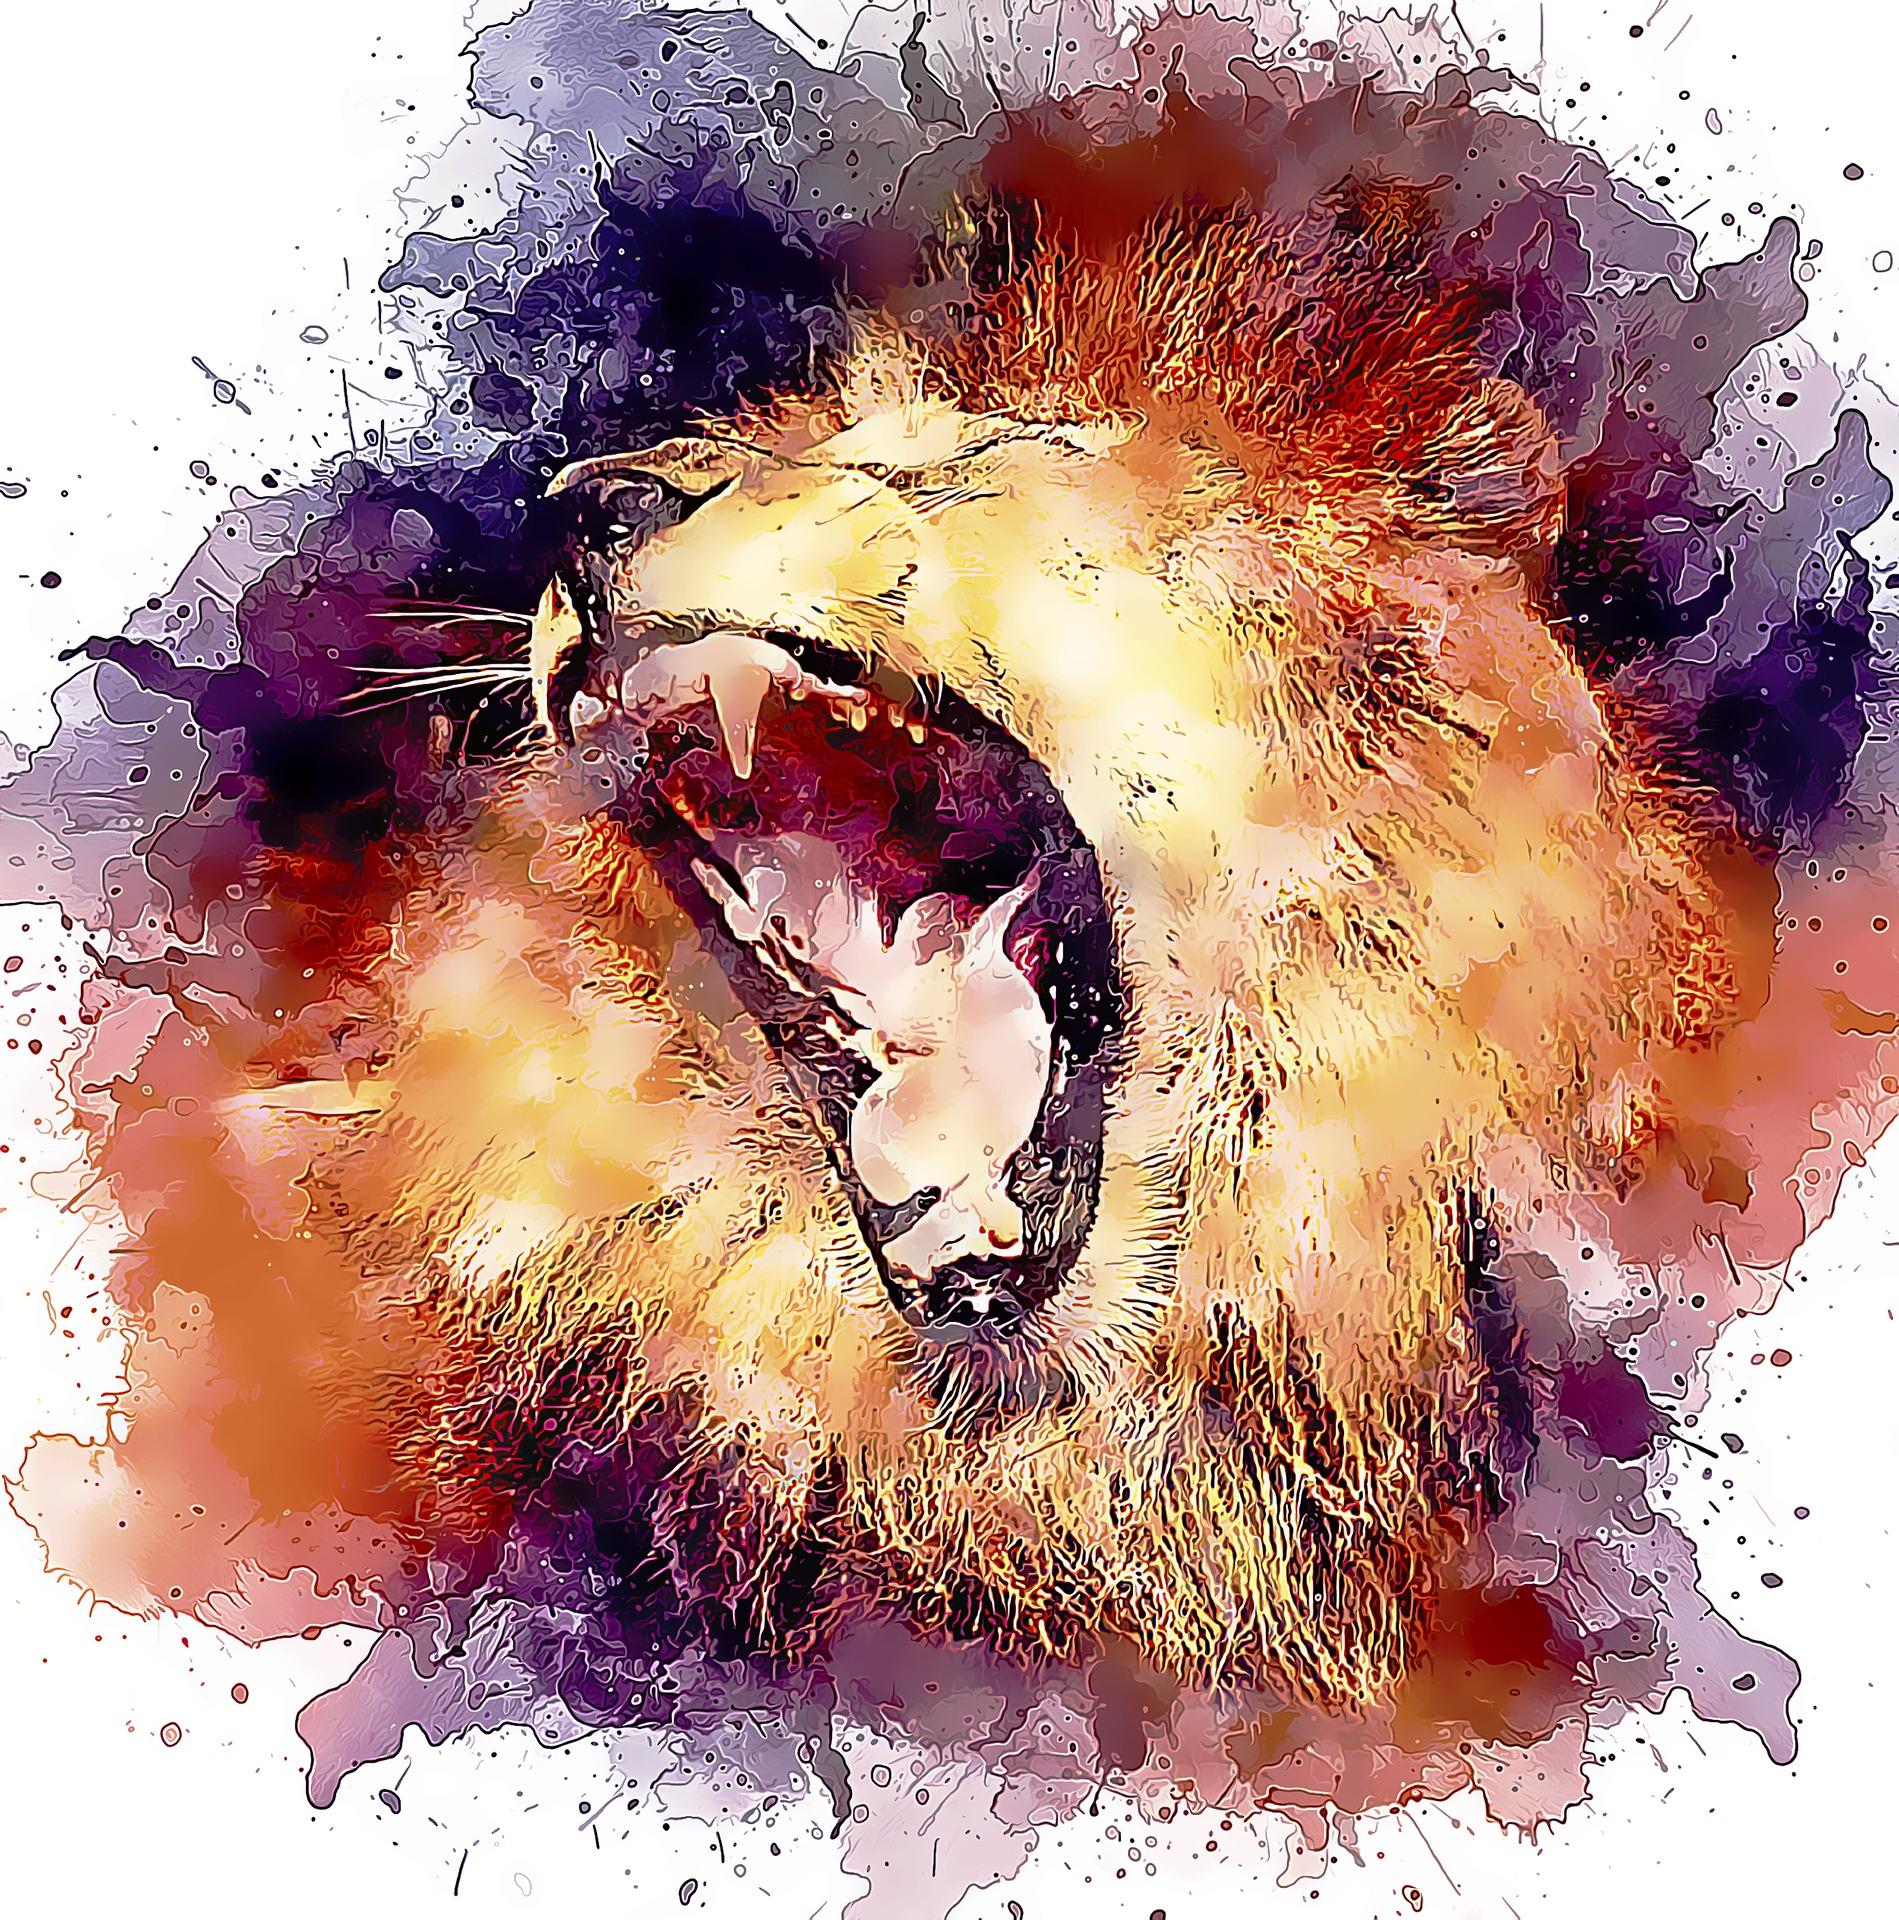 lion-Fatherheart-France